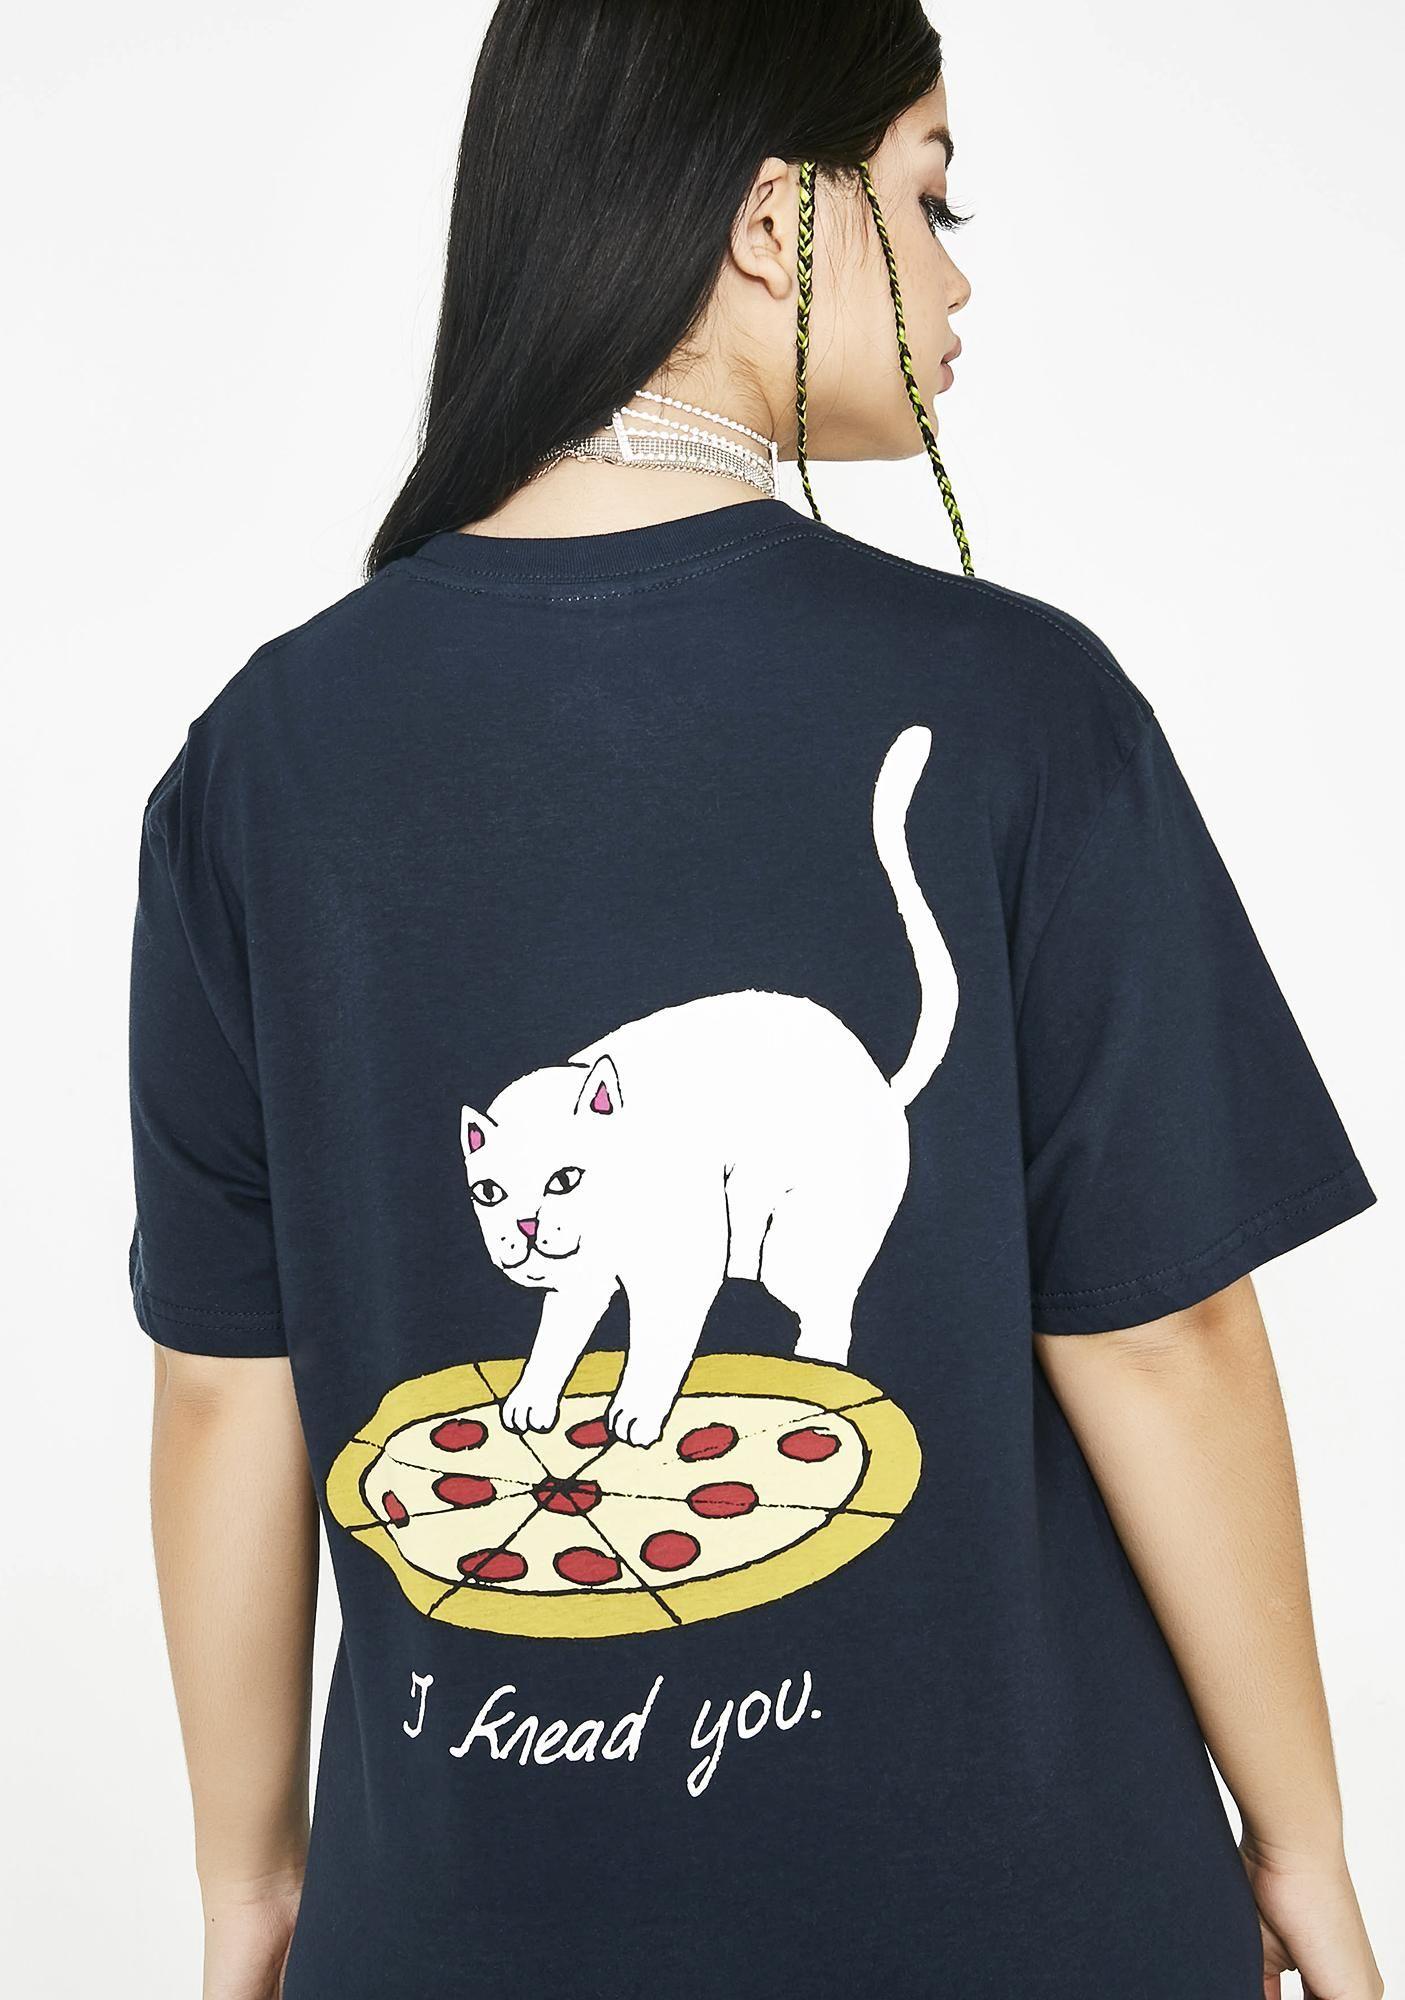 9d1a2d80d27bd9 RIPNDIP P.R.E.A.M. Tee | Dolls Kill #dollskill #ripndip #skate #graphictee # cat #pizza #knead